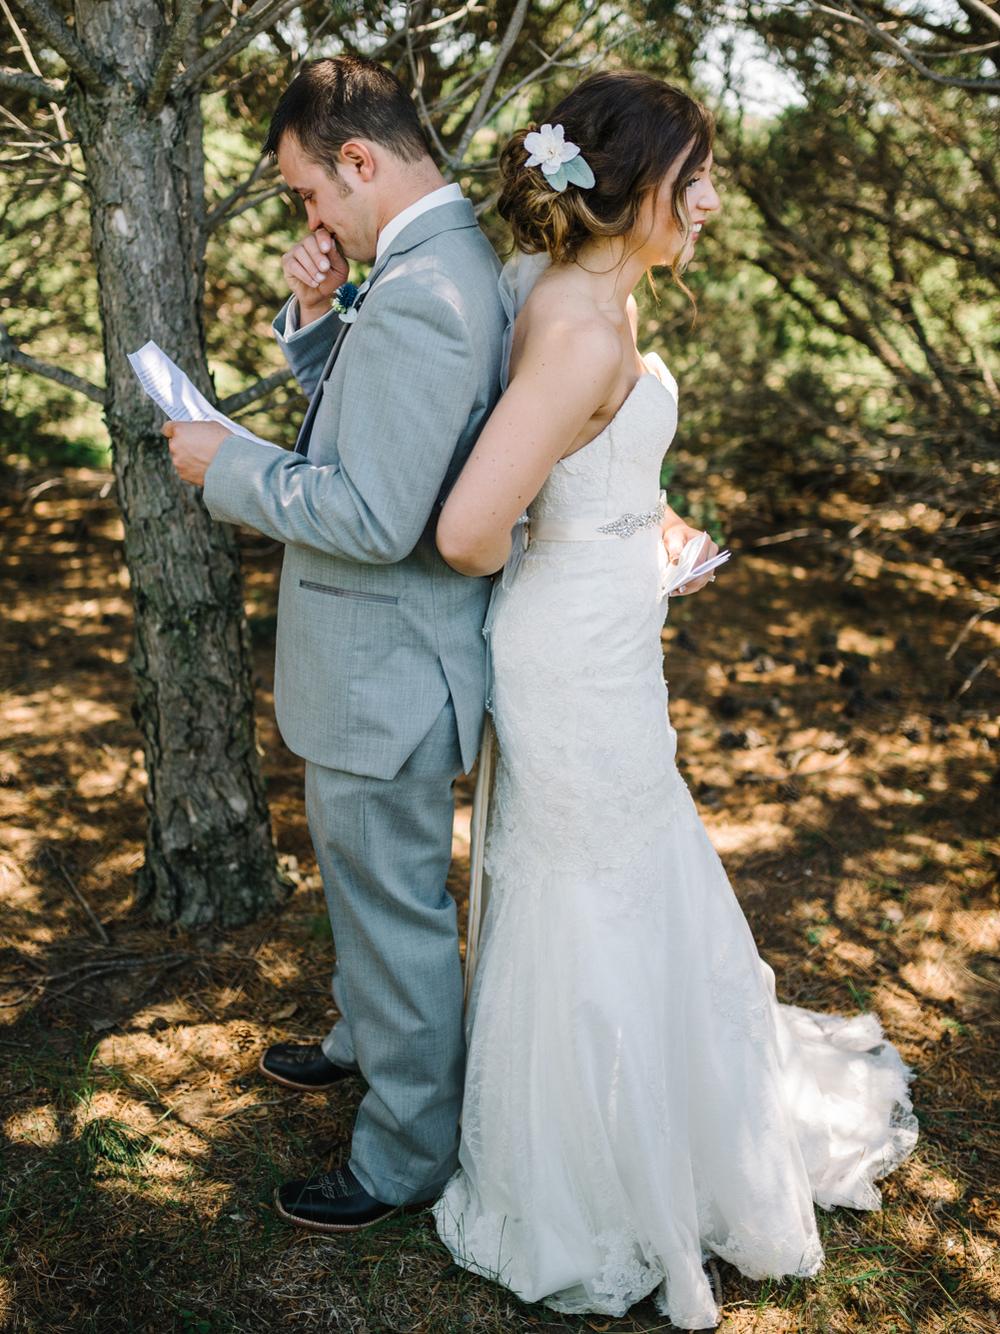 Dodge City, Kansas Wedding-Neal Dieker-Western Kansas Wedding Photographer-Dodge City, Kansas Wedding Photography-Wichita, Kansas Wedding Photographer-205.jpg